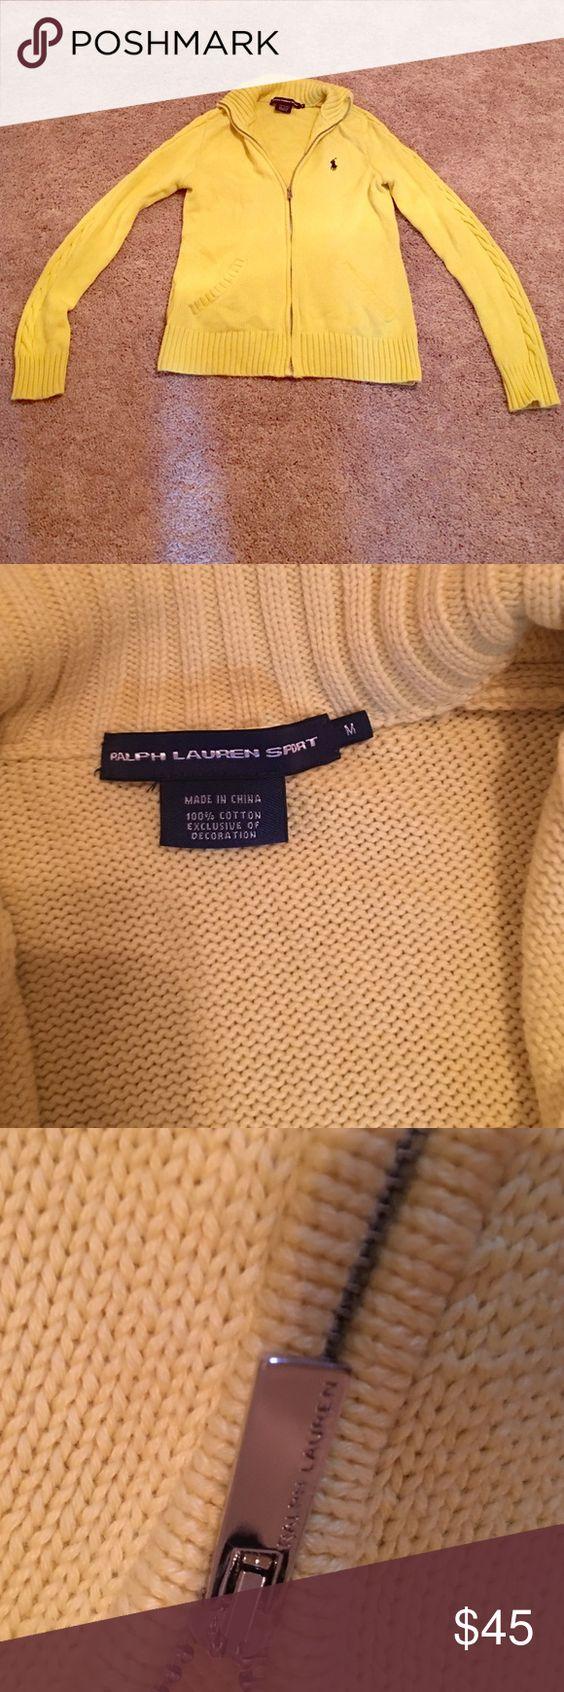 Ralph Lauren zip up sweater Women's bright yellow Ralph Lauren zip up sweater with navy logo. Size medium. Great for fall or winter! Polo by Ralph Lauren Sweaters